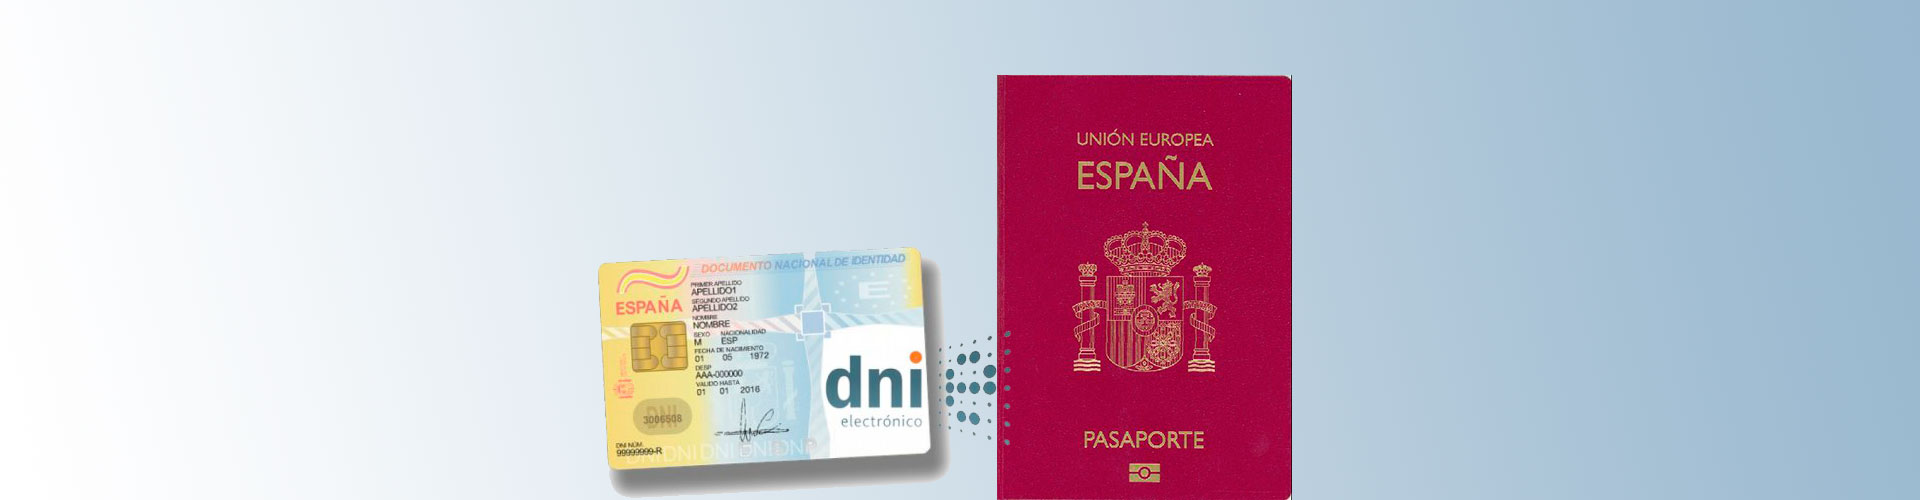 DNI y pasaporte español